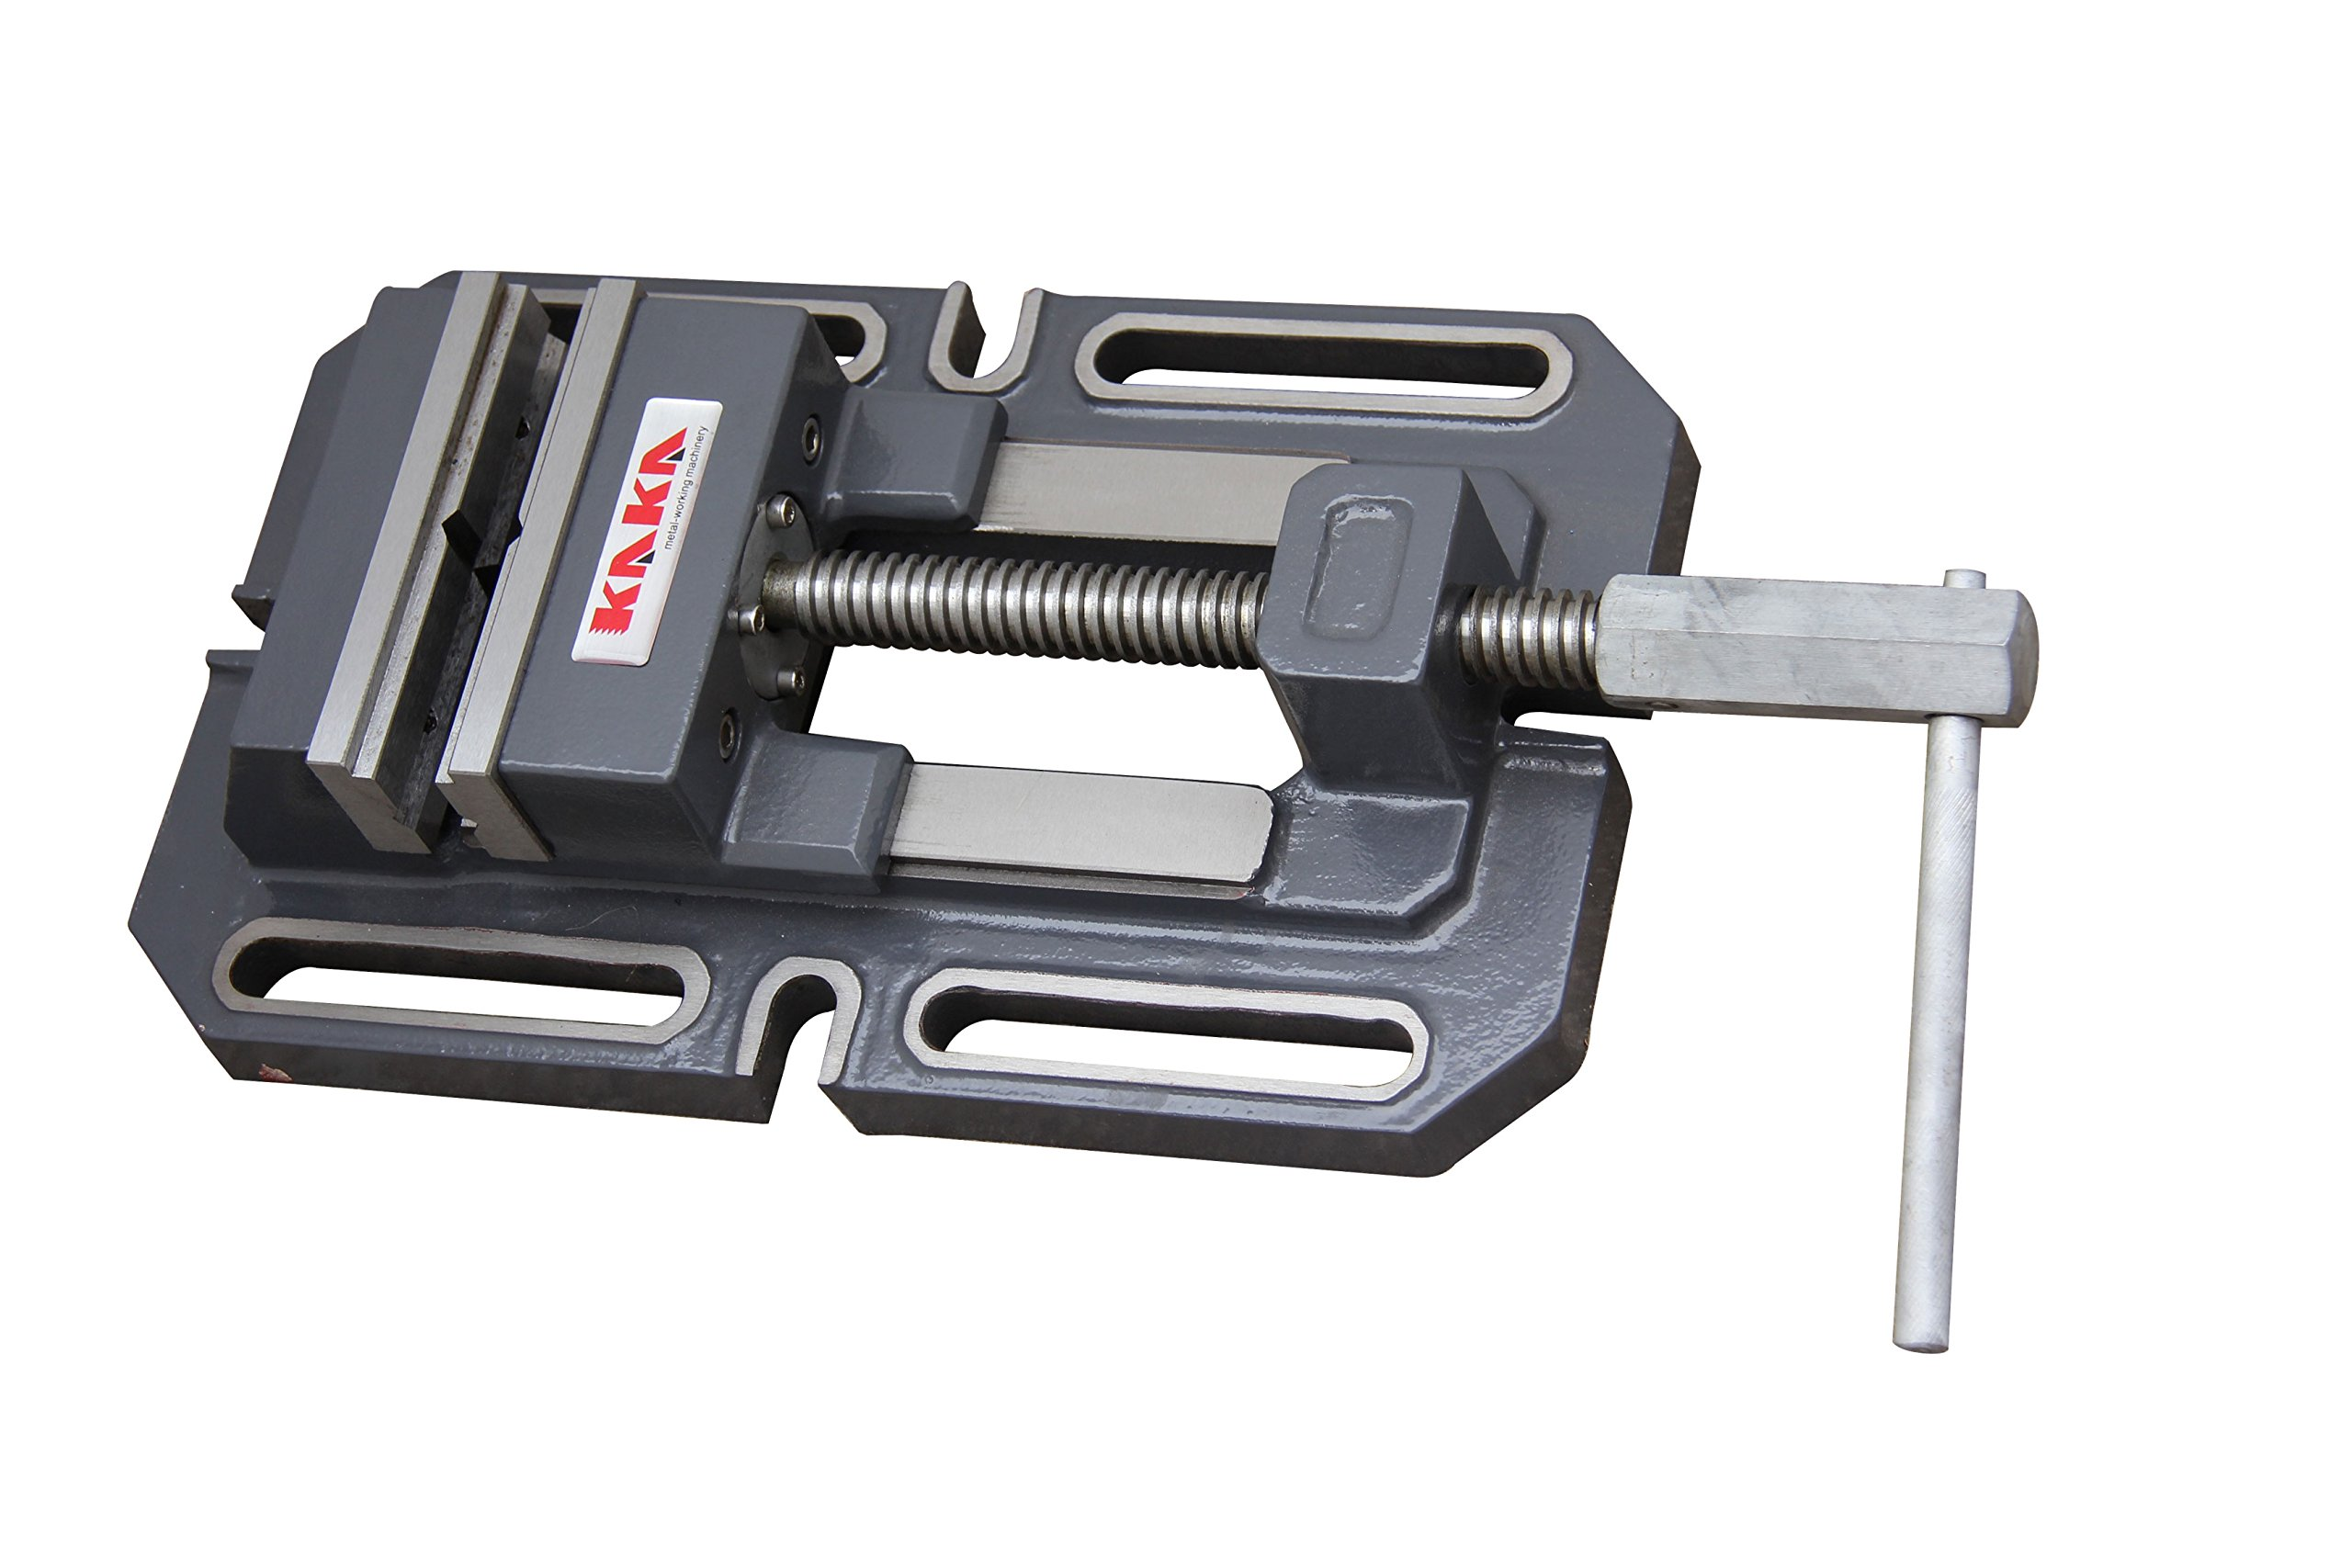 Kaka Industrial Drill Press Machine Vise Tsl140